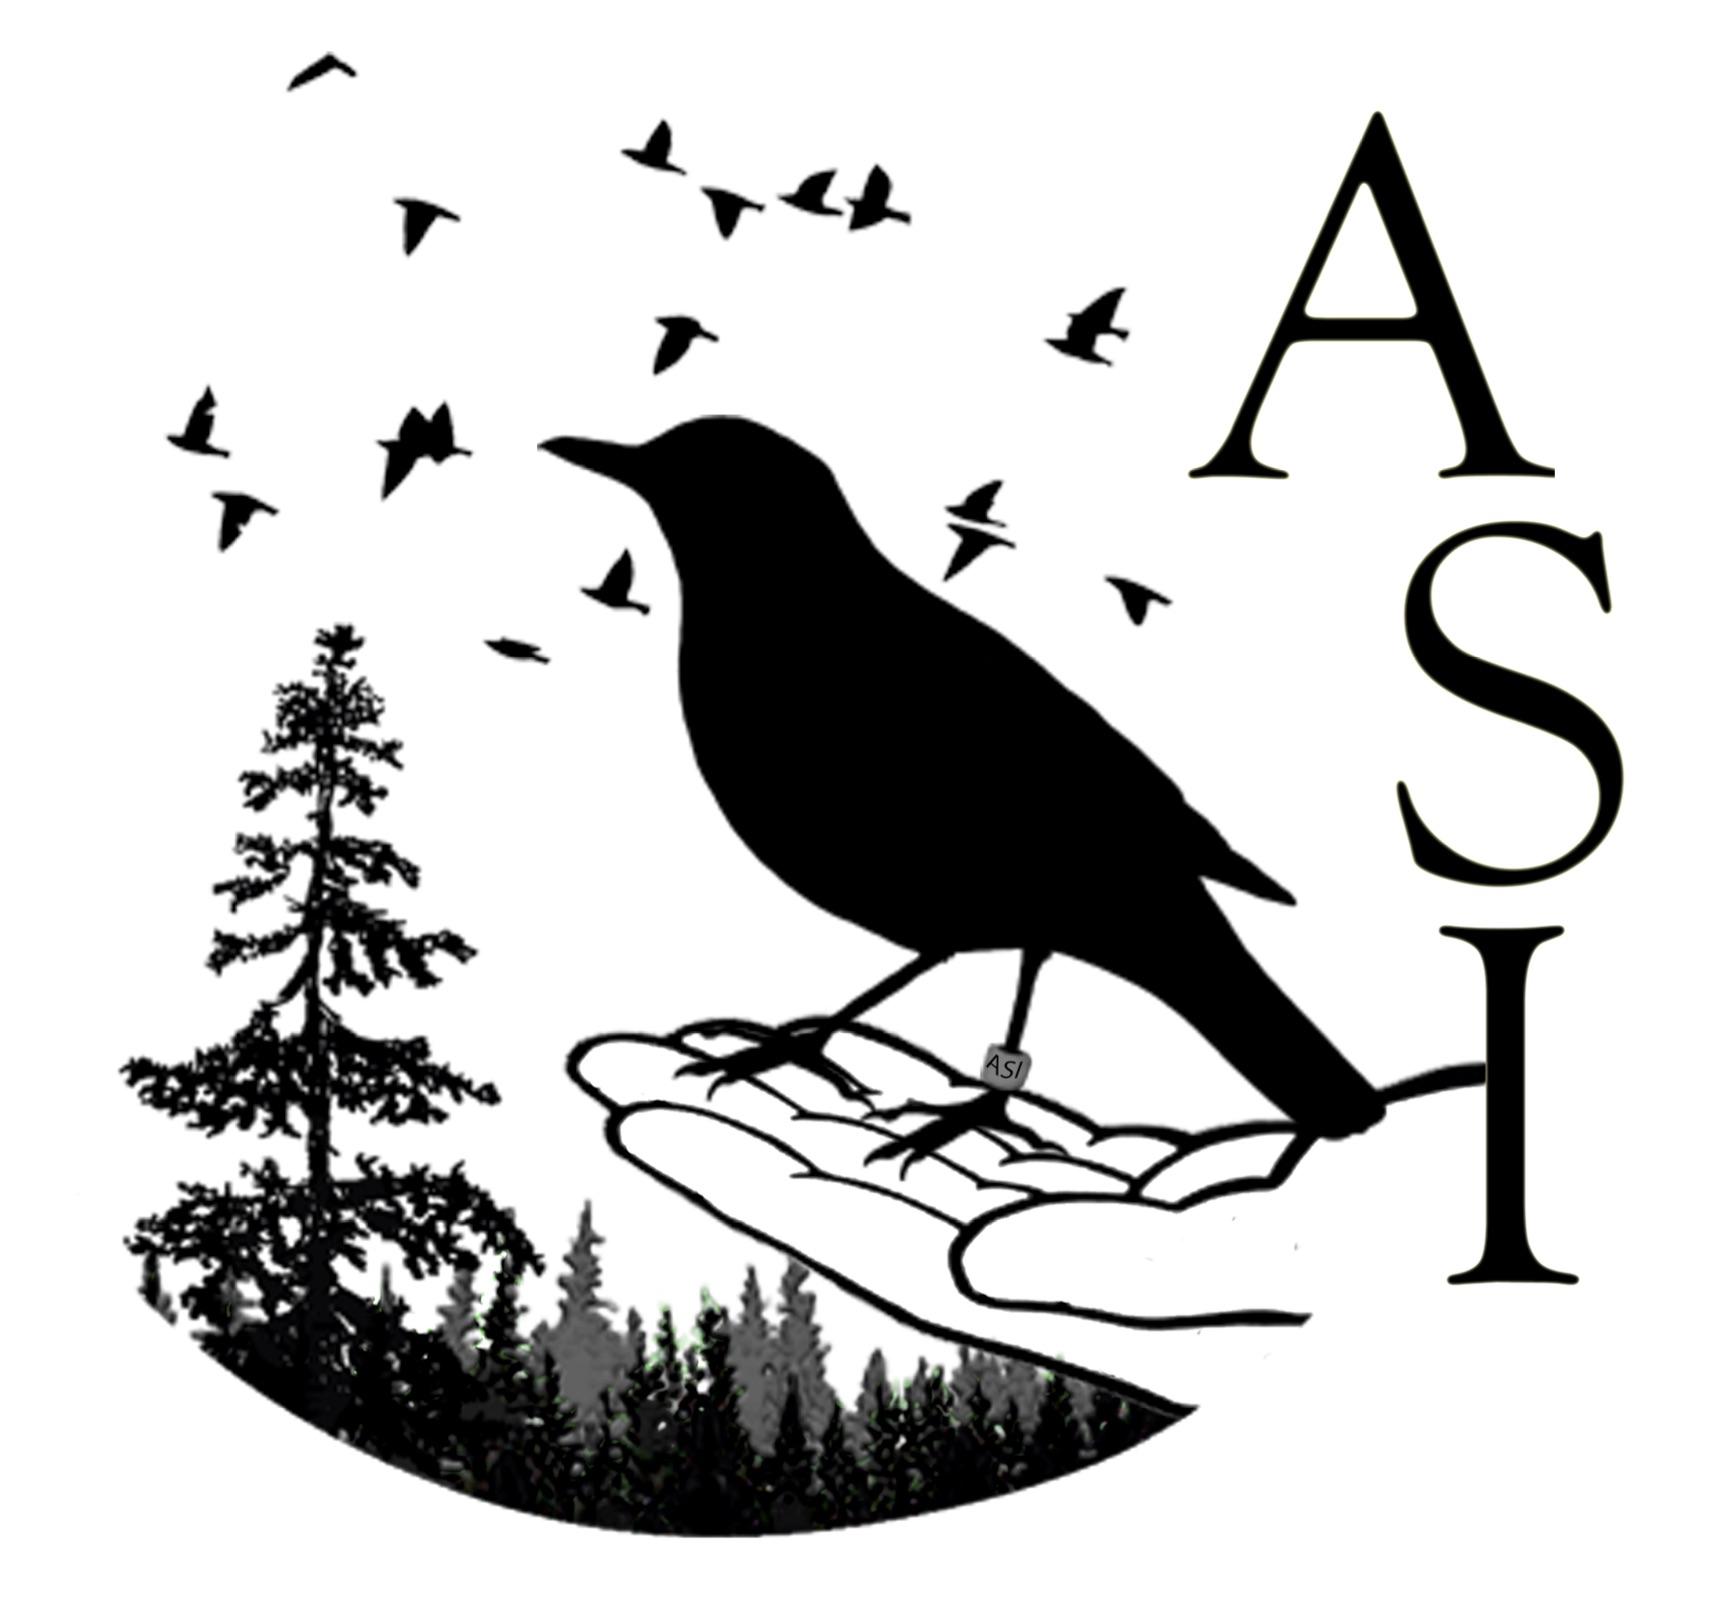 ASI.jpg